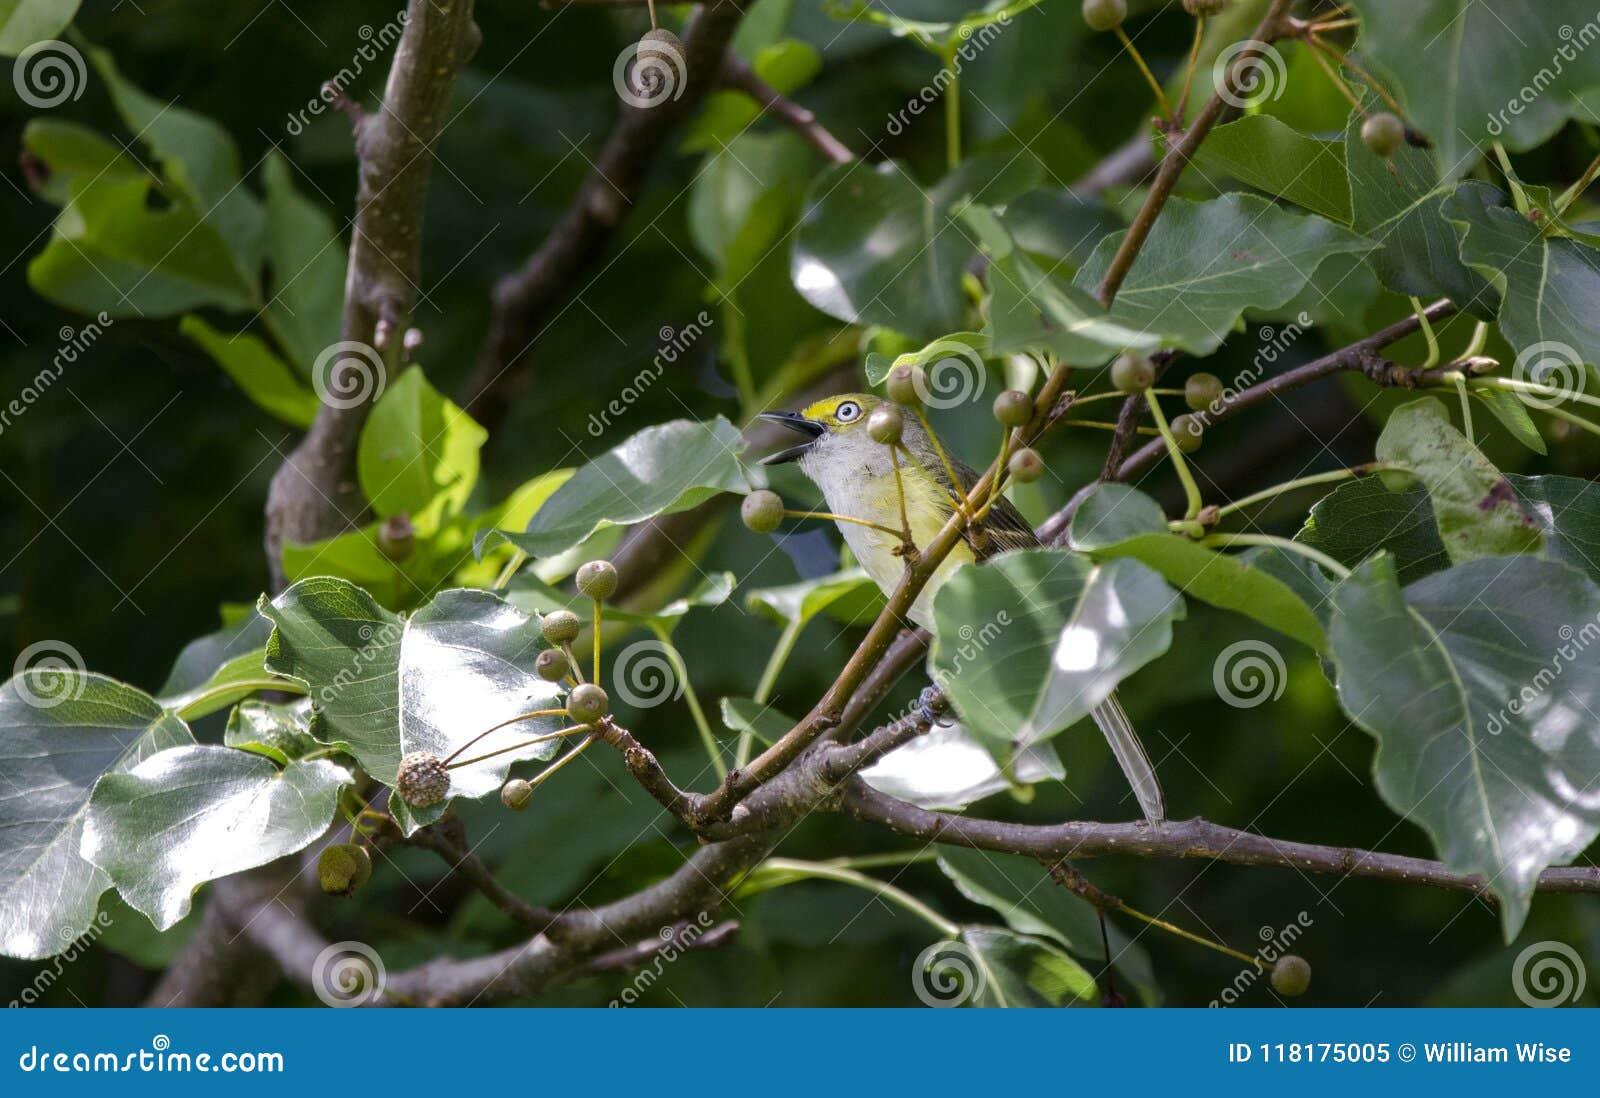 White-eyed Vireo songbird singing in Bradford Pear Tree, Georgia USA